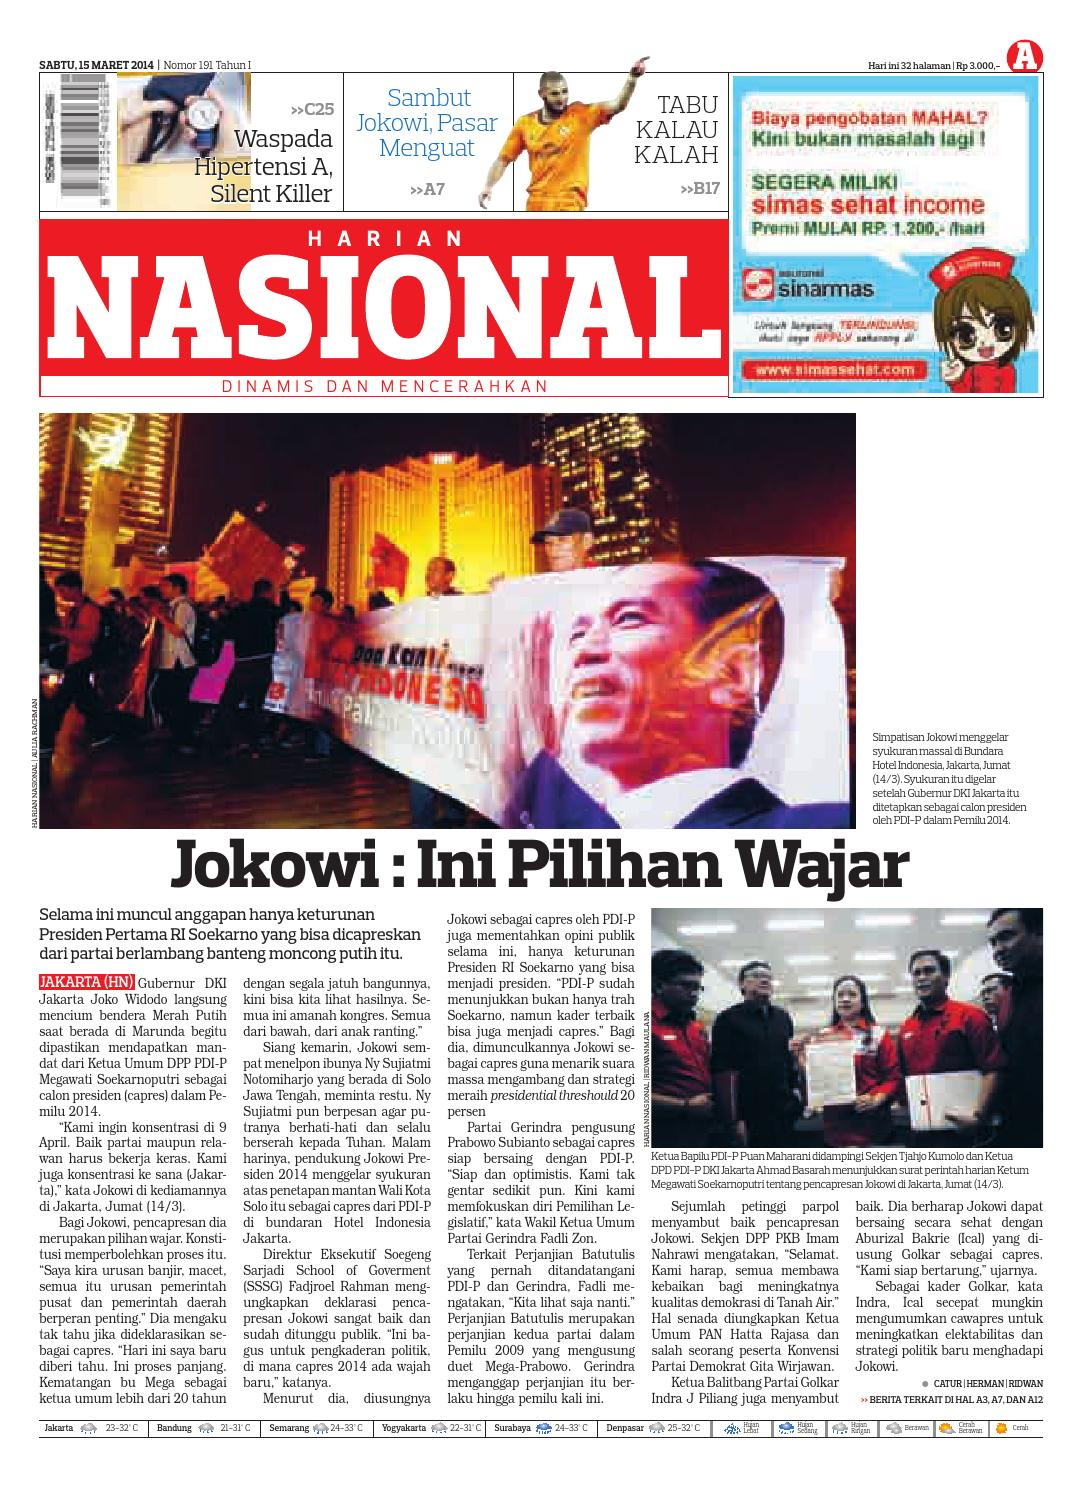 Harian Nasional By Issuu Produk Ukm Bumn Ring Mutiara Mas Putih Laut